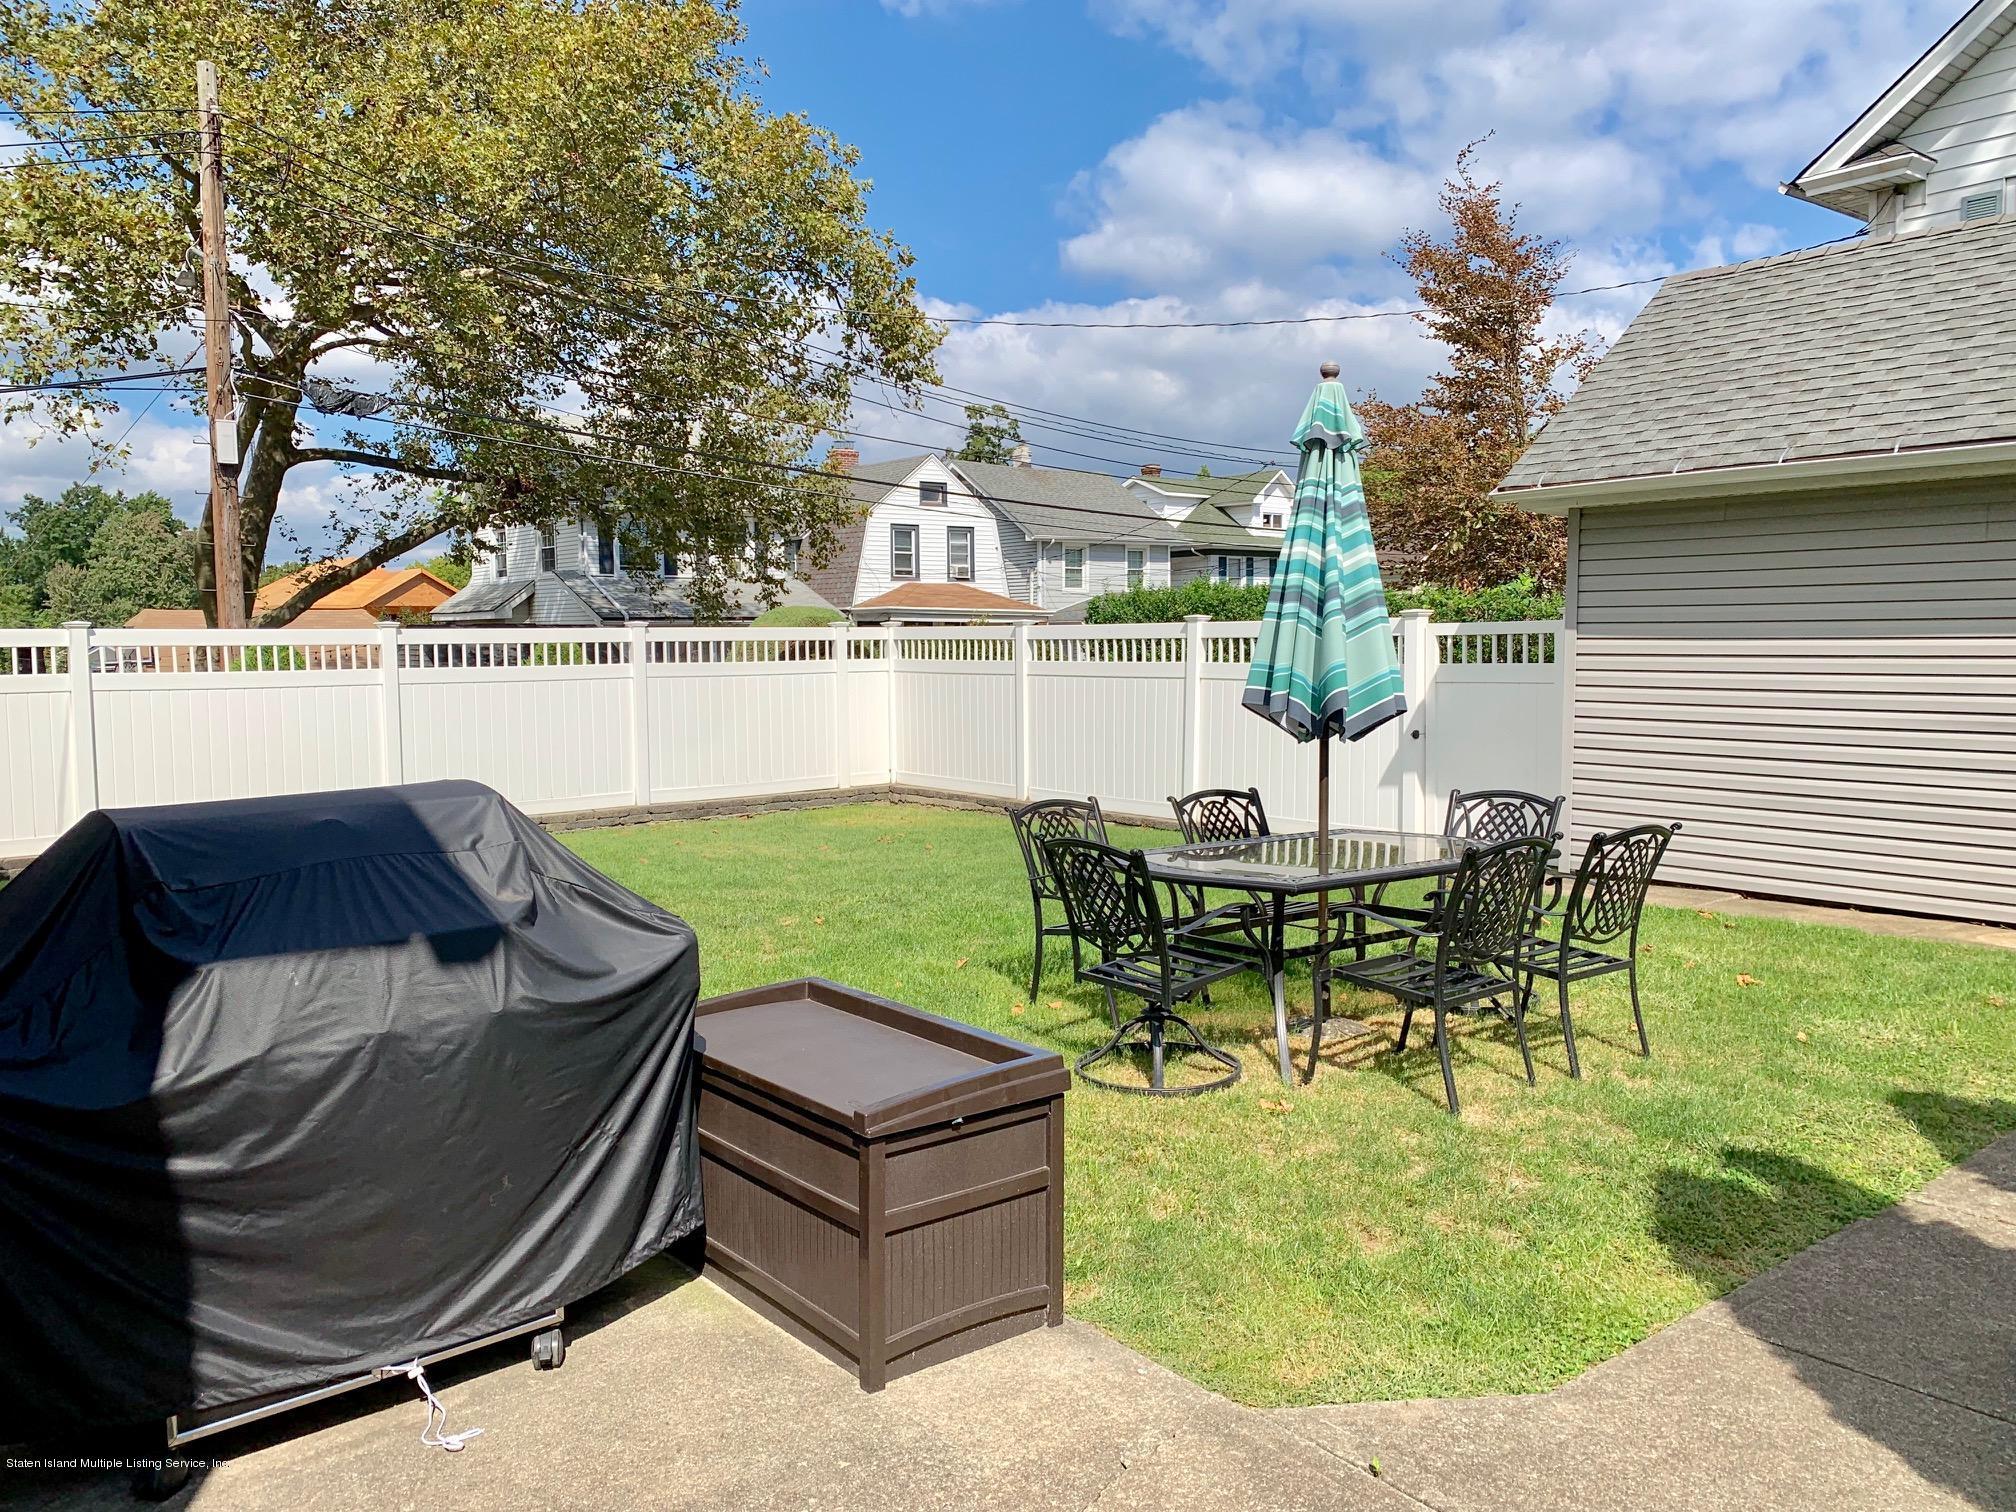 Single Family - Detached 195 Fairview Avenue  Staten Island, NY 10314, MLS-1132423-36